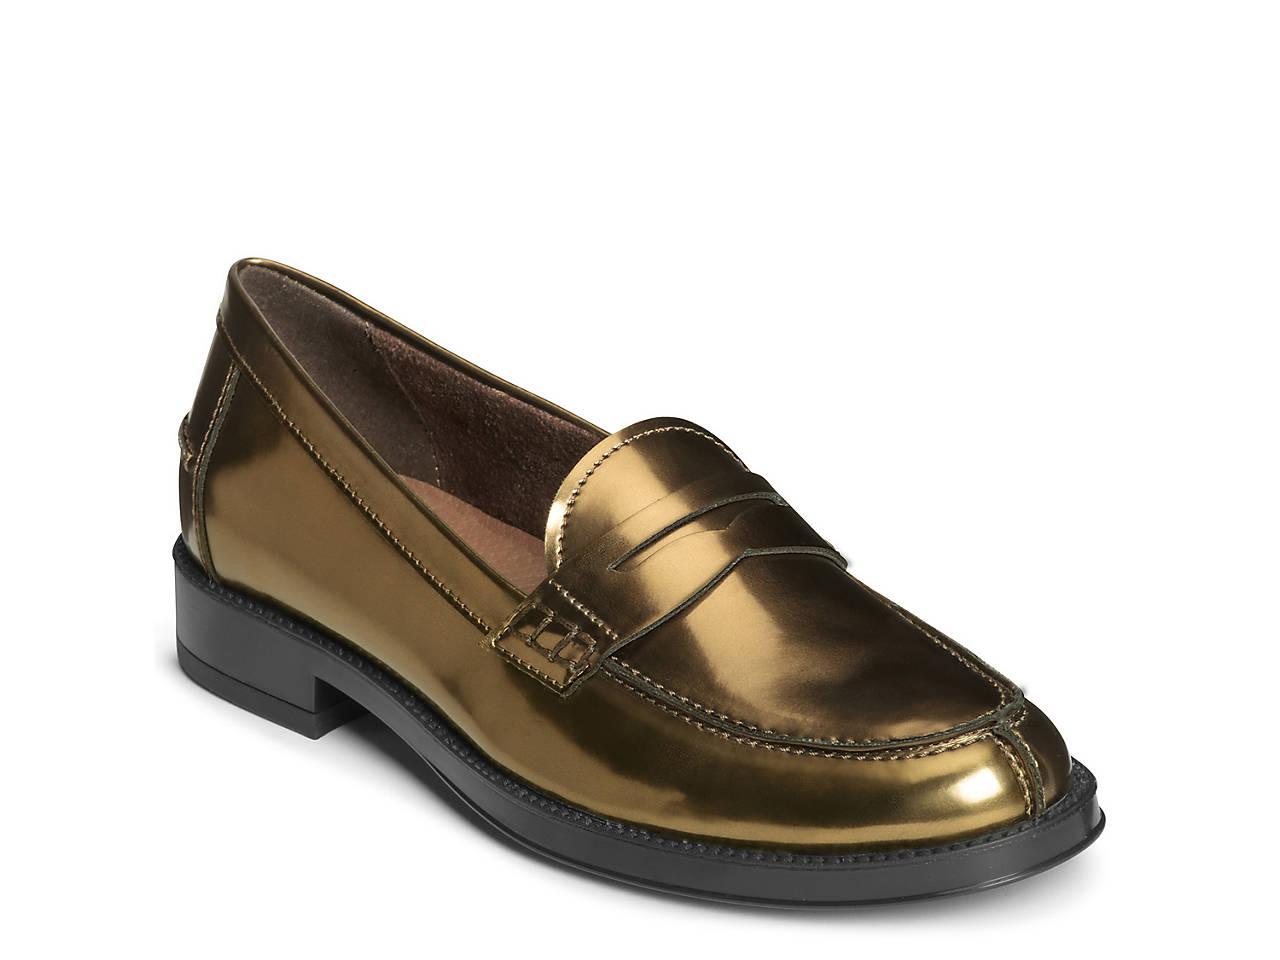 dce51aacf34 Aerosoles Push Ups Penny Loafer Women s Shoes